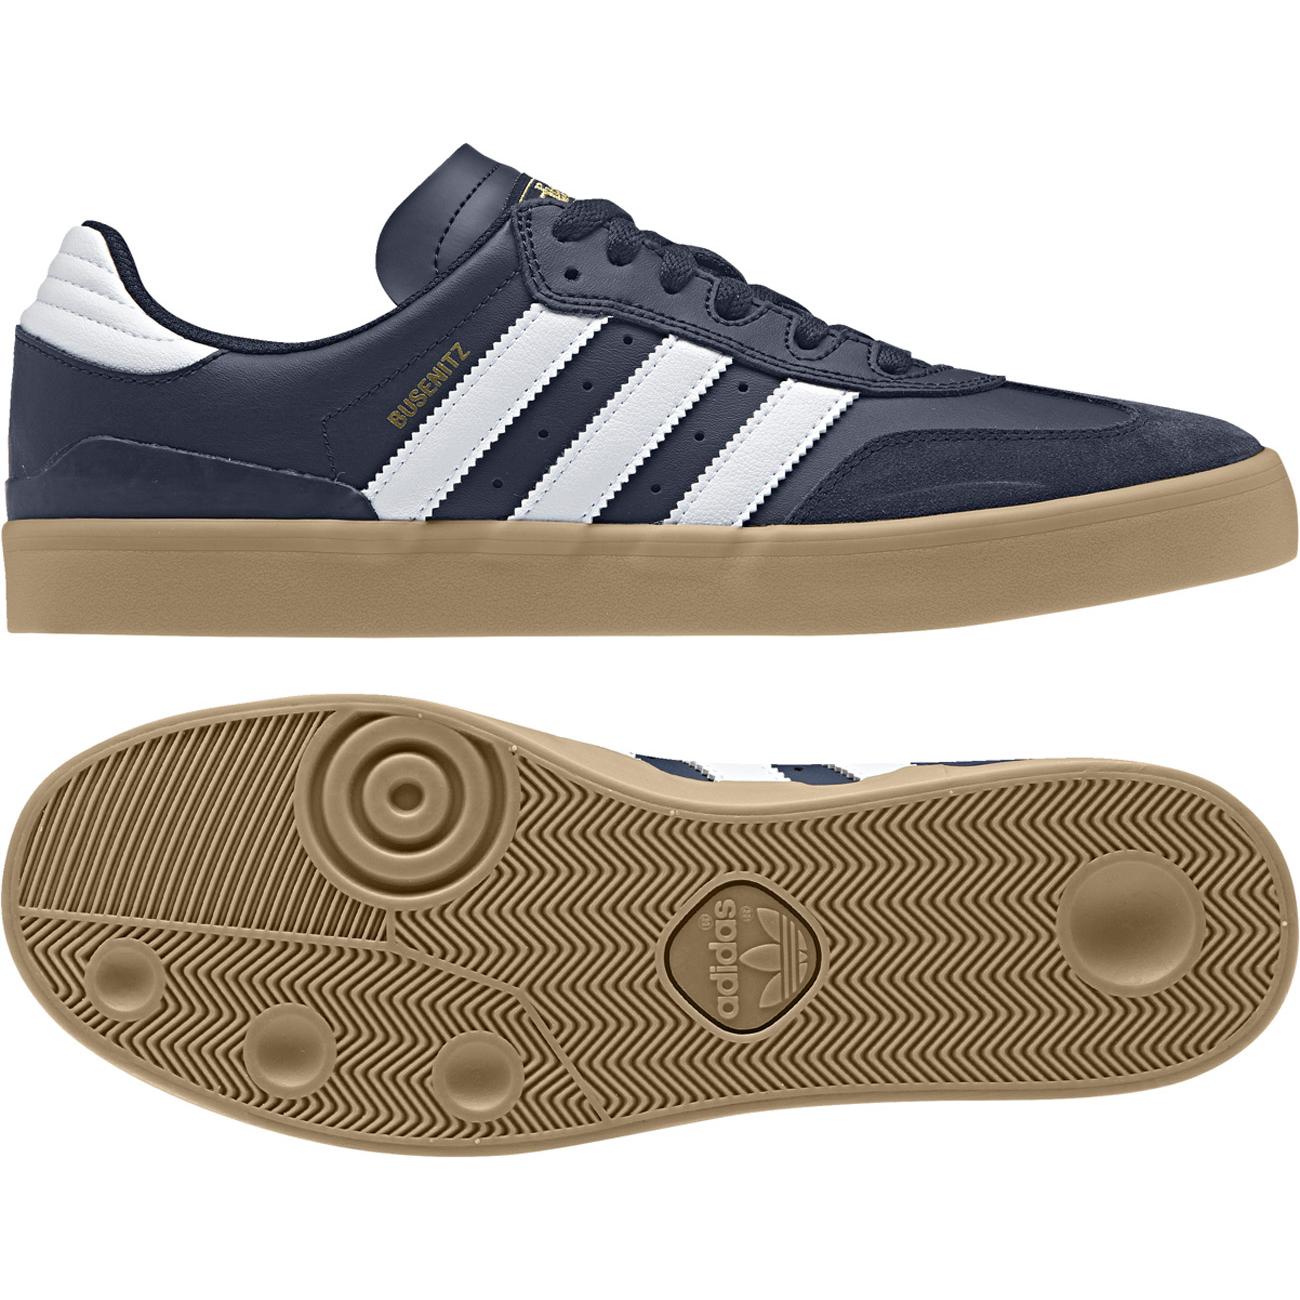 RX Sneaker Herren VULC Adidas BUSENITZ K1cTJlFu3